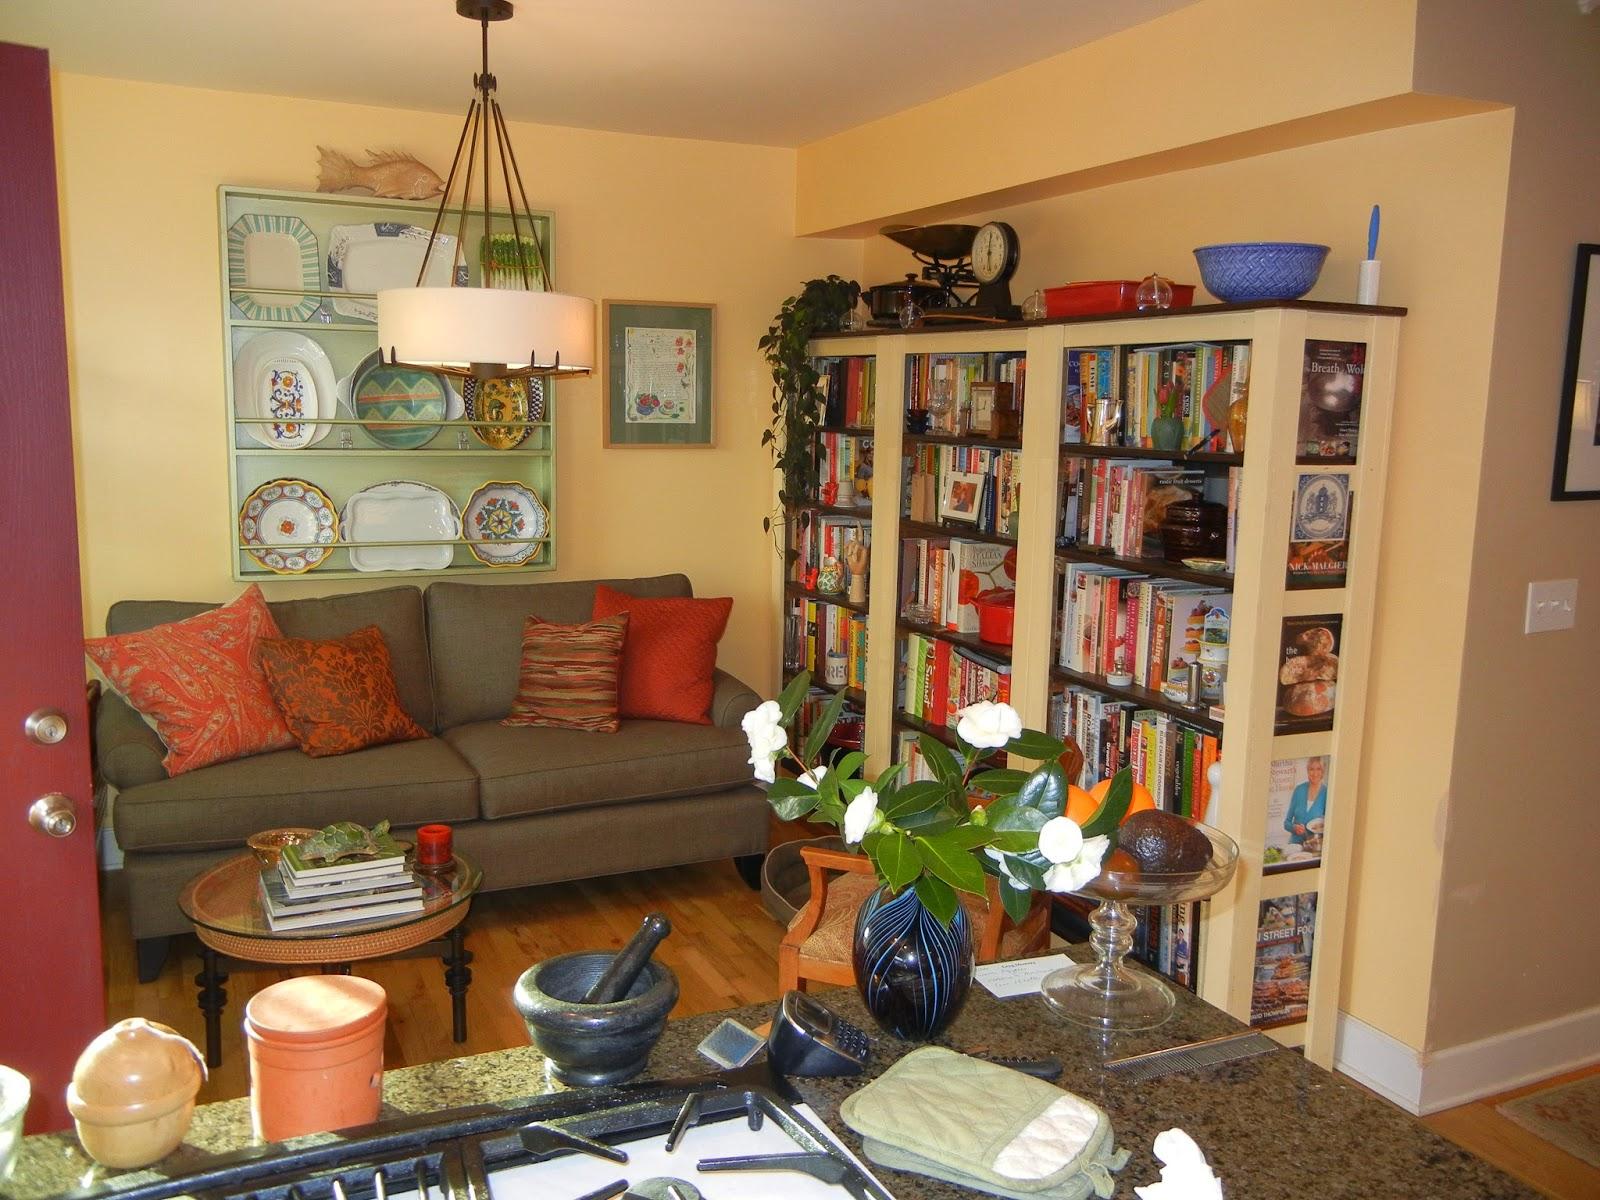 Reorganizing Room: Leaving New York: SPRING 2015 HOUSE REORGANIZATION